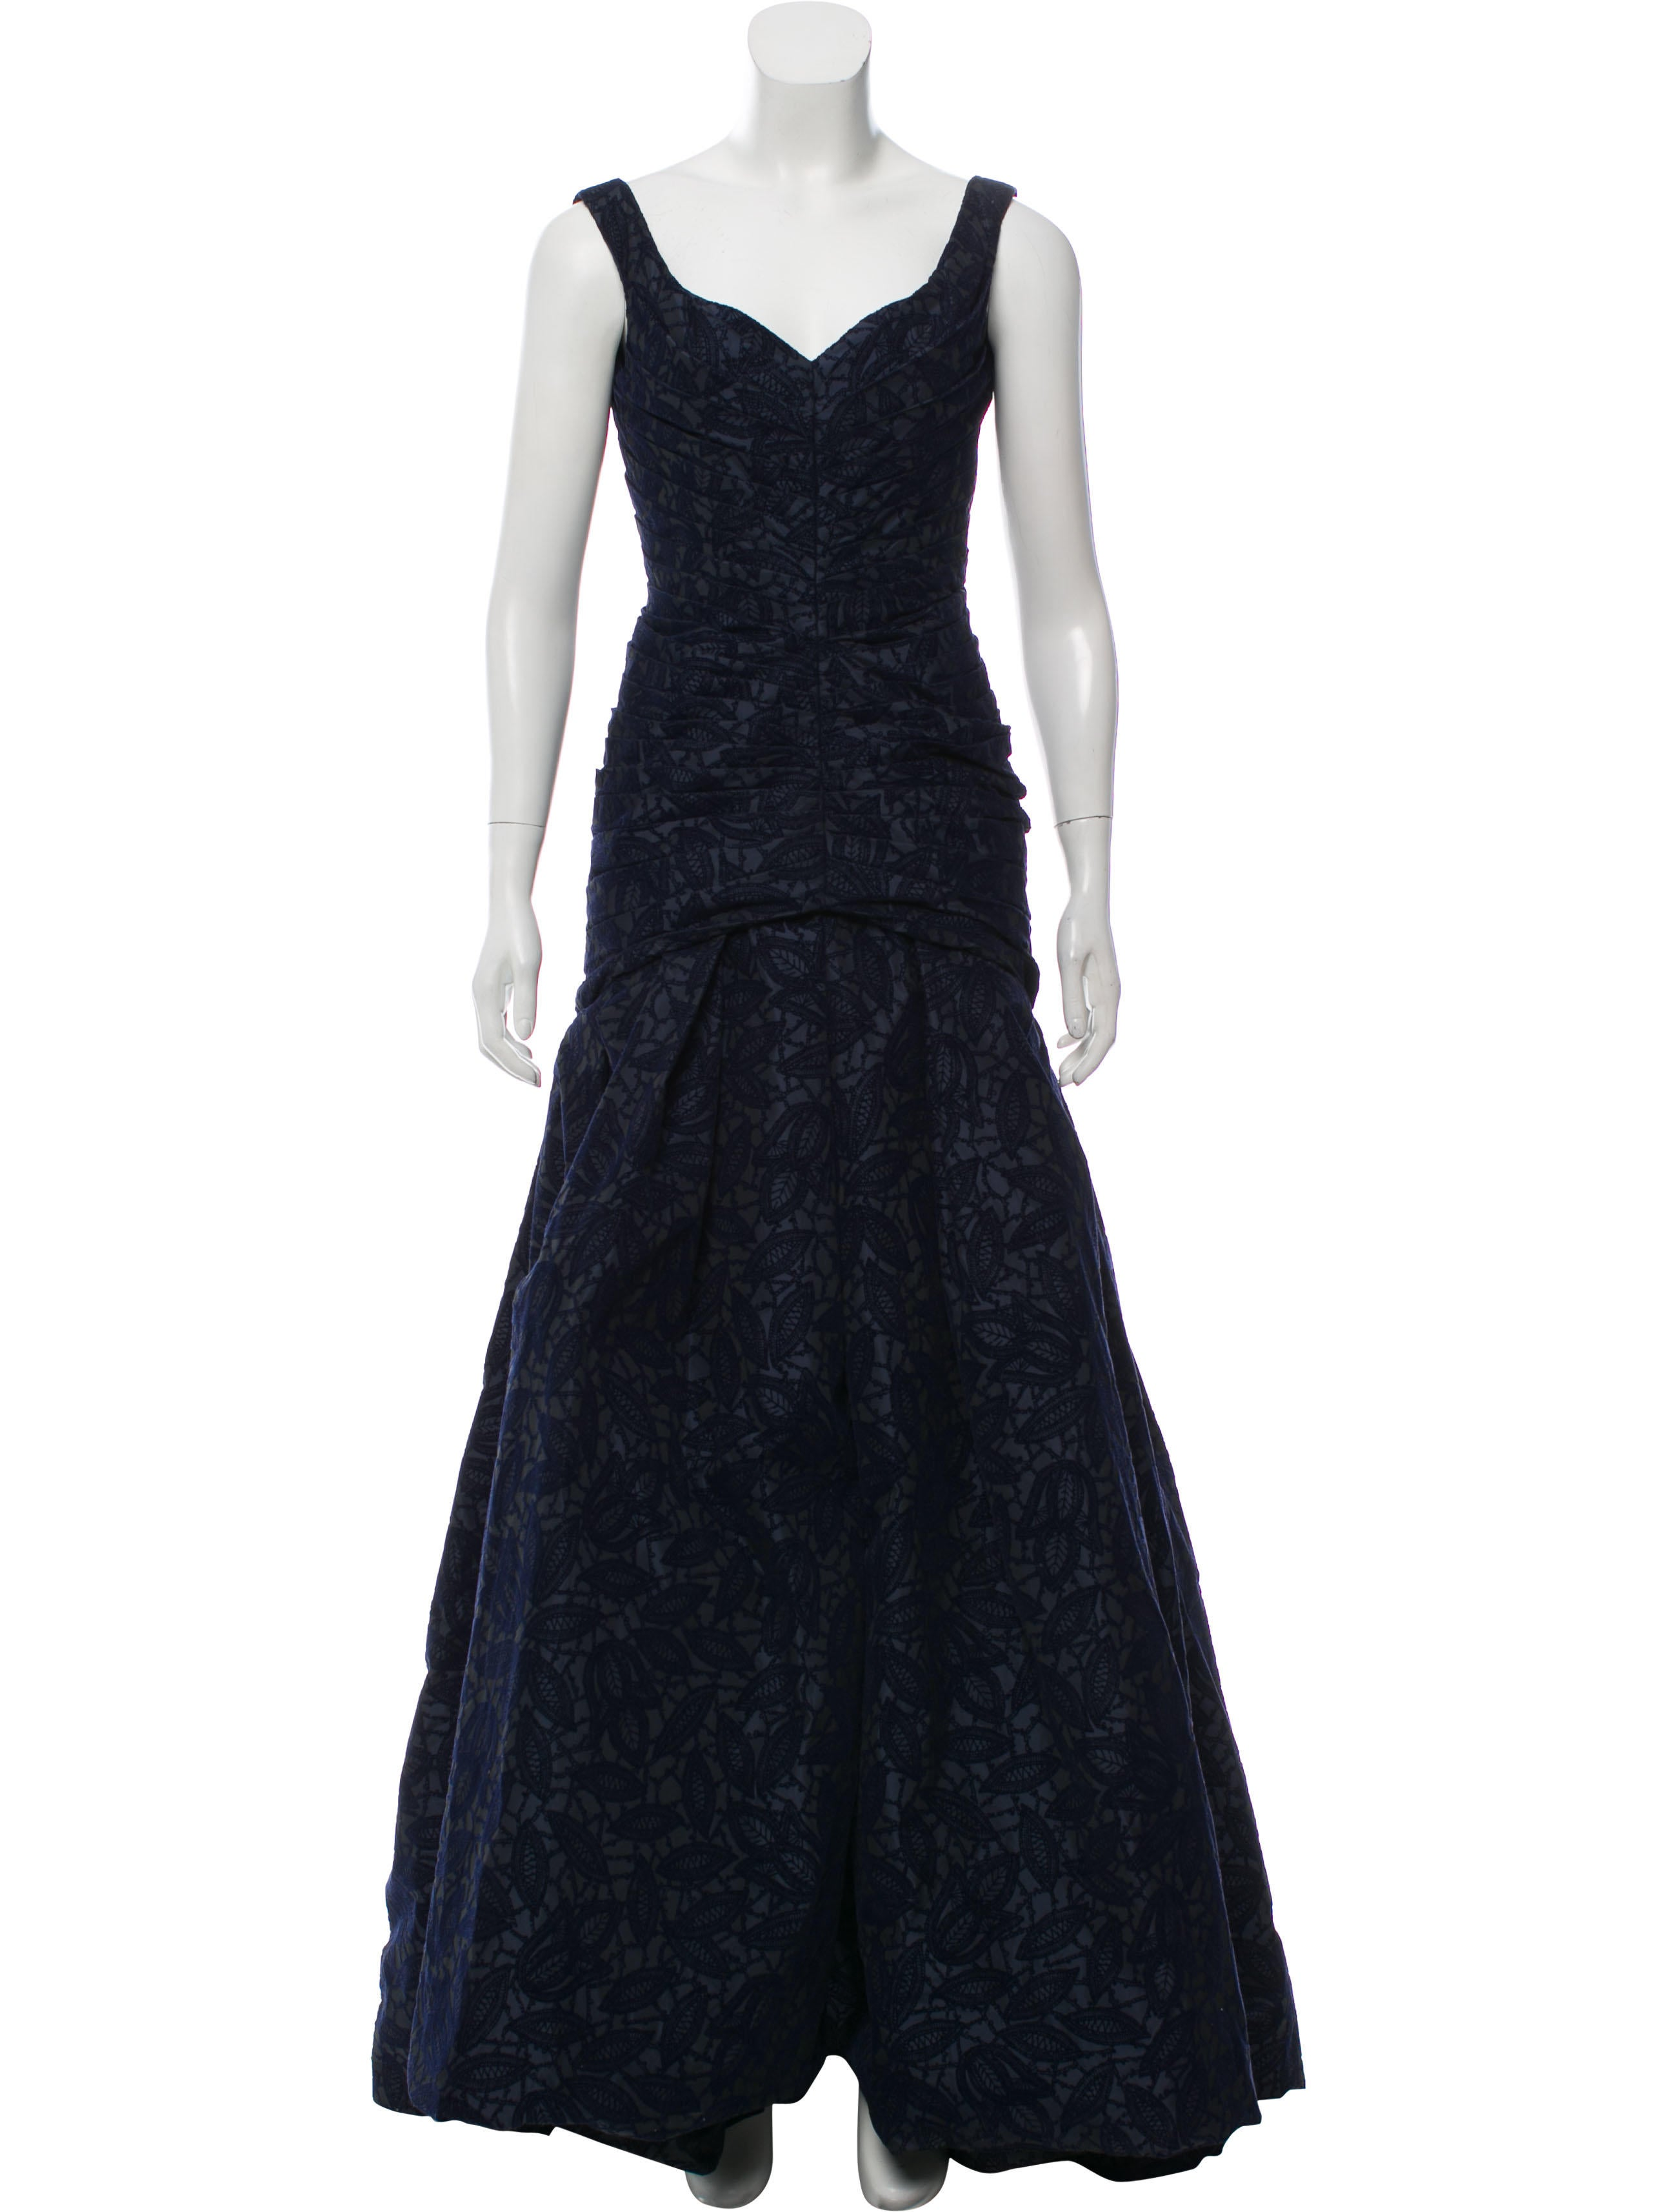 Zac Posen Devoré Evening Dress - Clothing - ZAC27334   The RealReal